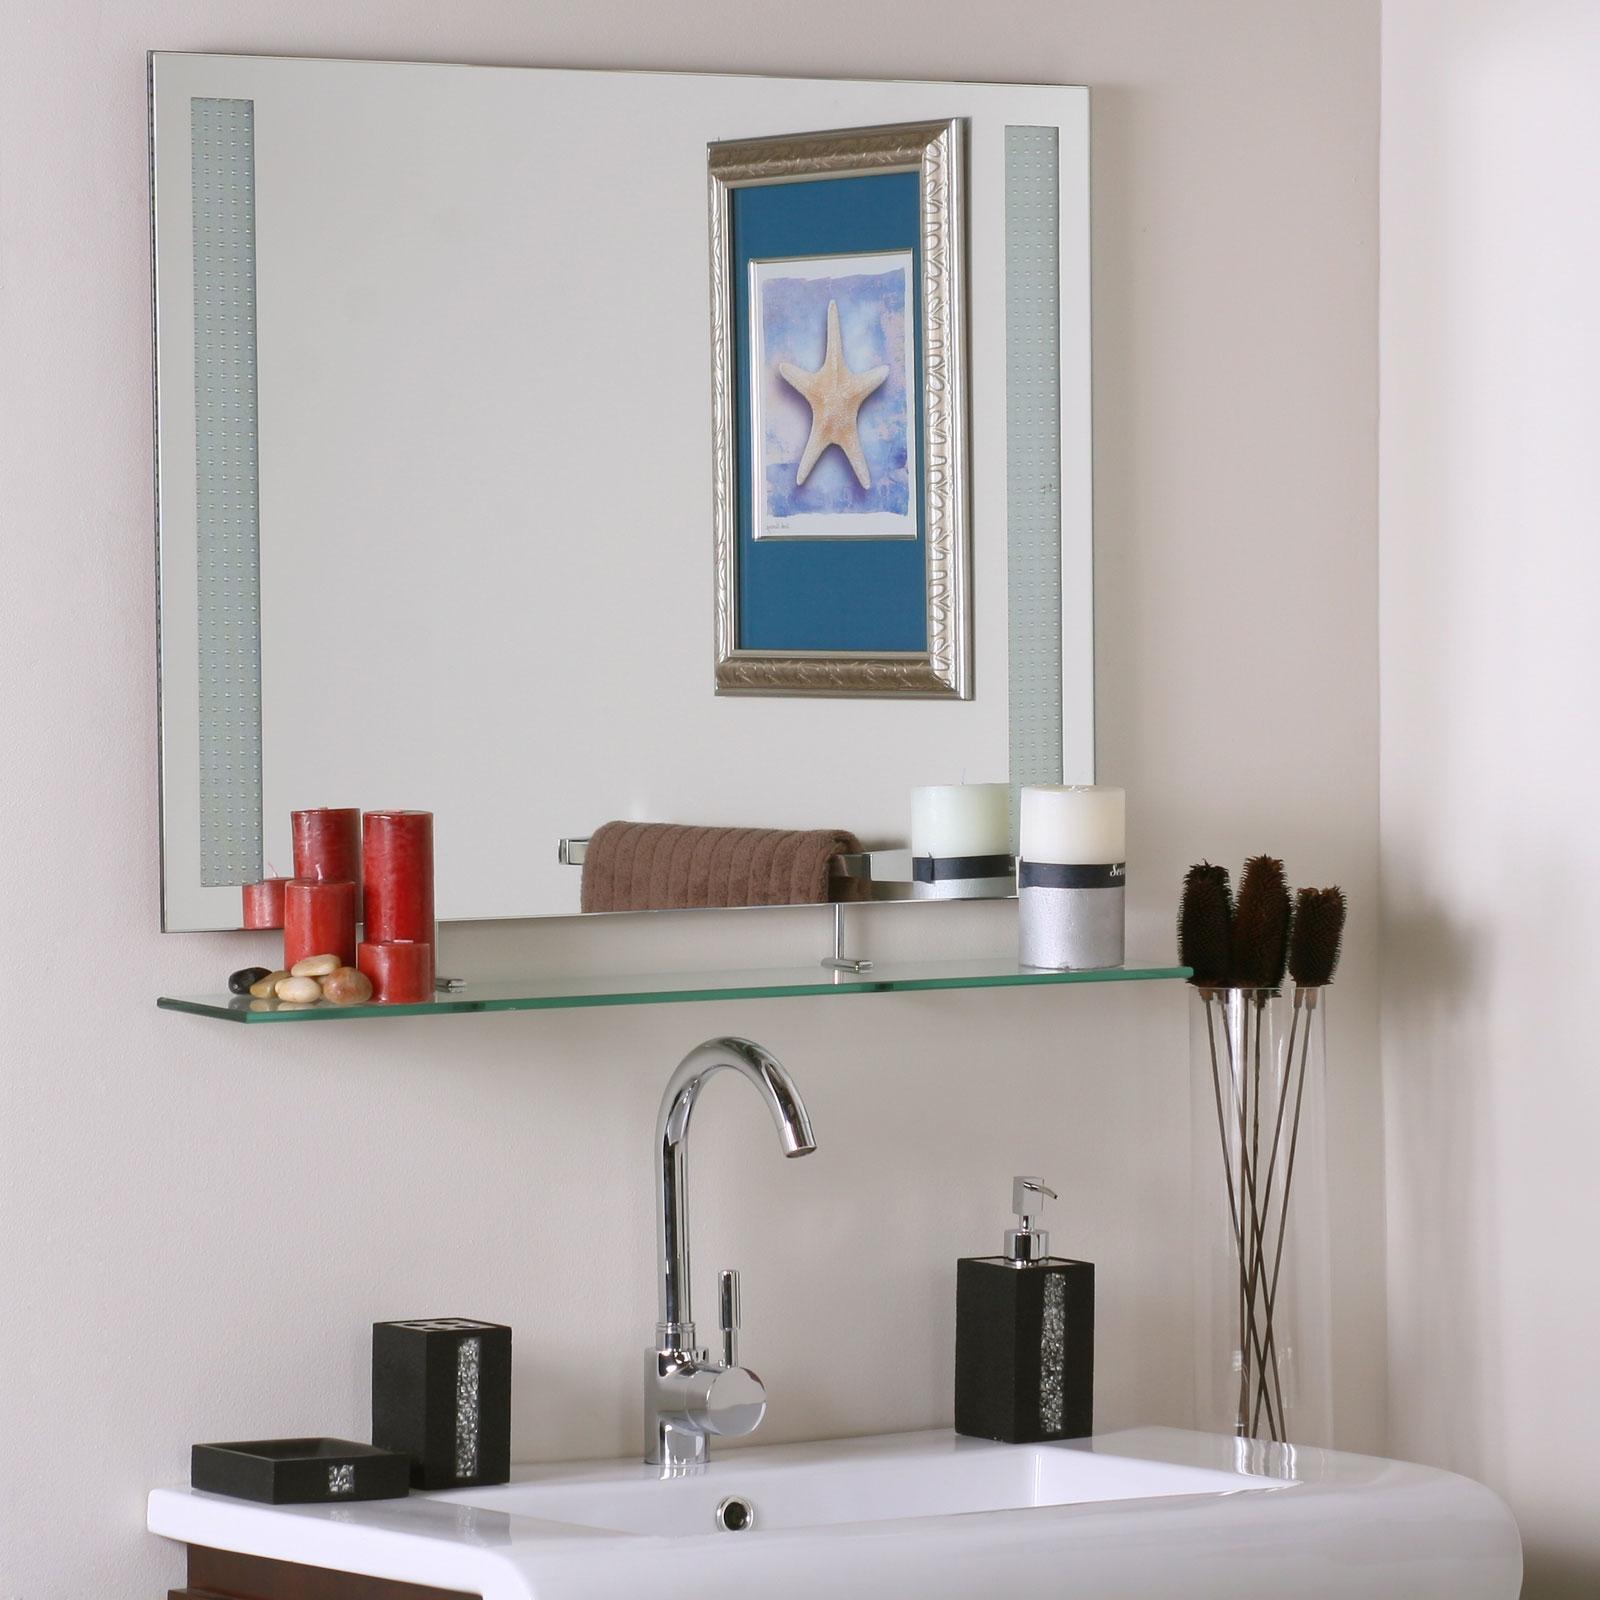 Bathroom Mirror With Shelves